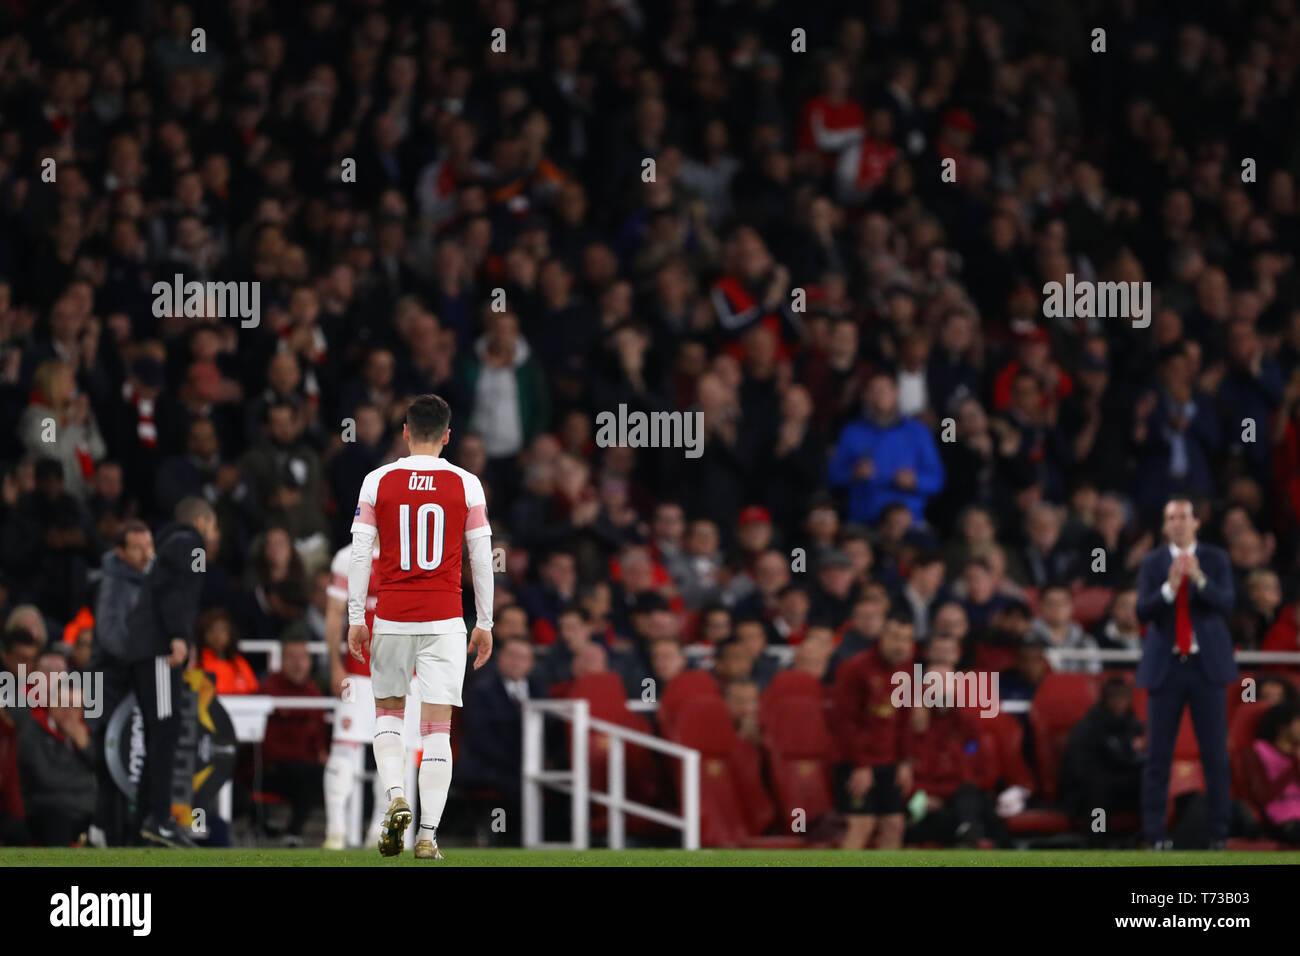 Mesut Ozil of Arsenal is substituted by Manager of Arsenal, Unai Emery - Arsenal v Valencia, UEFA Europa League Semi Final - 1st Leg, Emirates Stadium - Stock Image